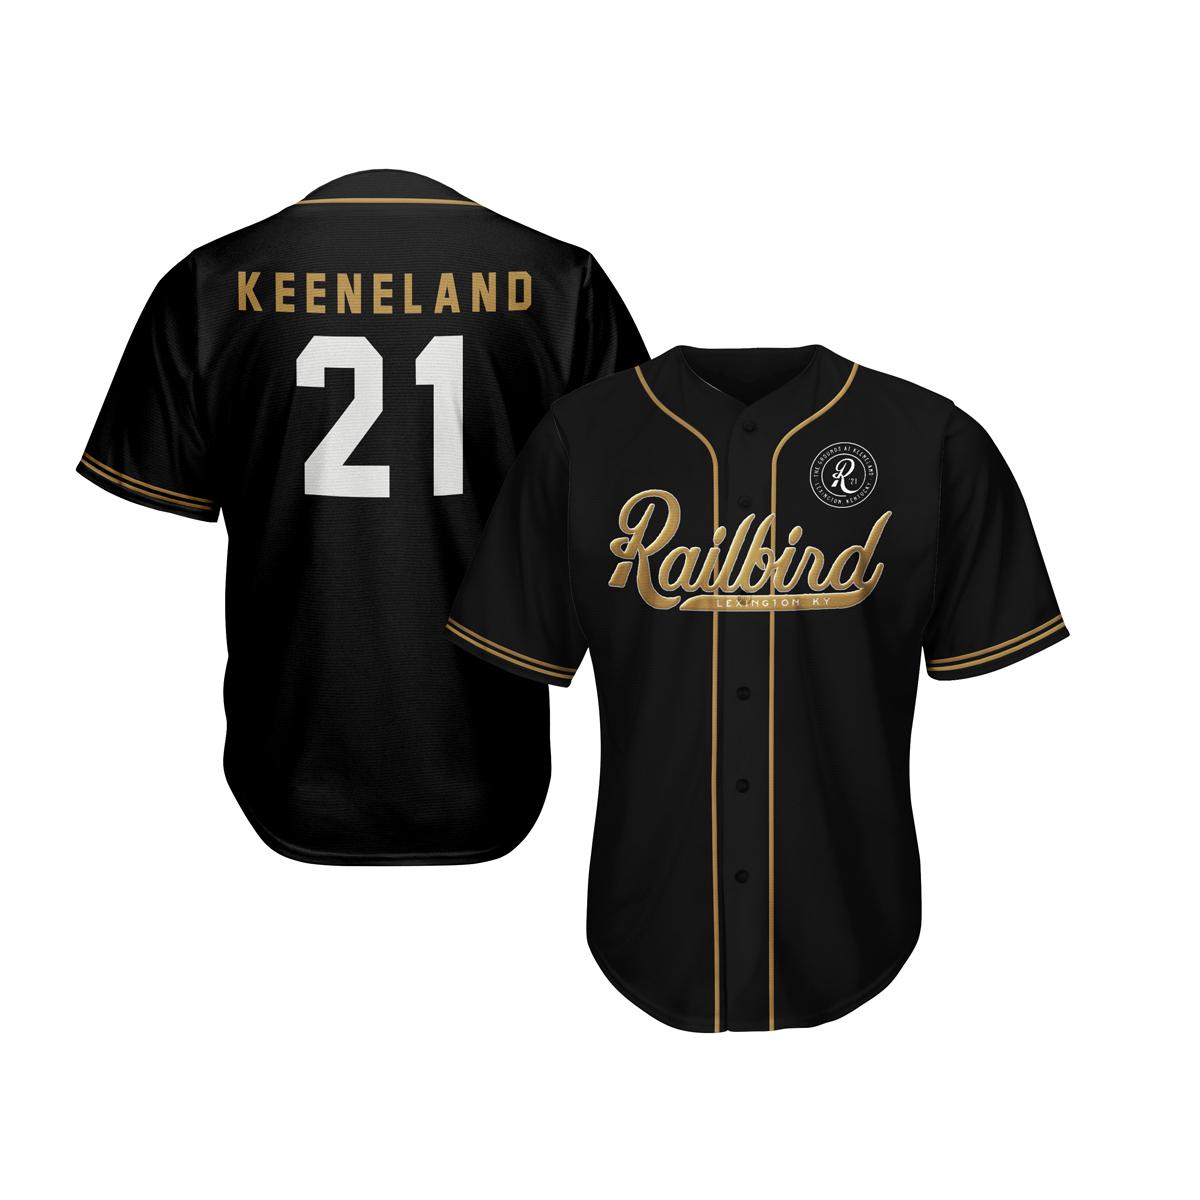 Limited Edition Custom Baseball Jersey